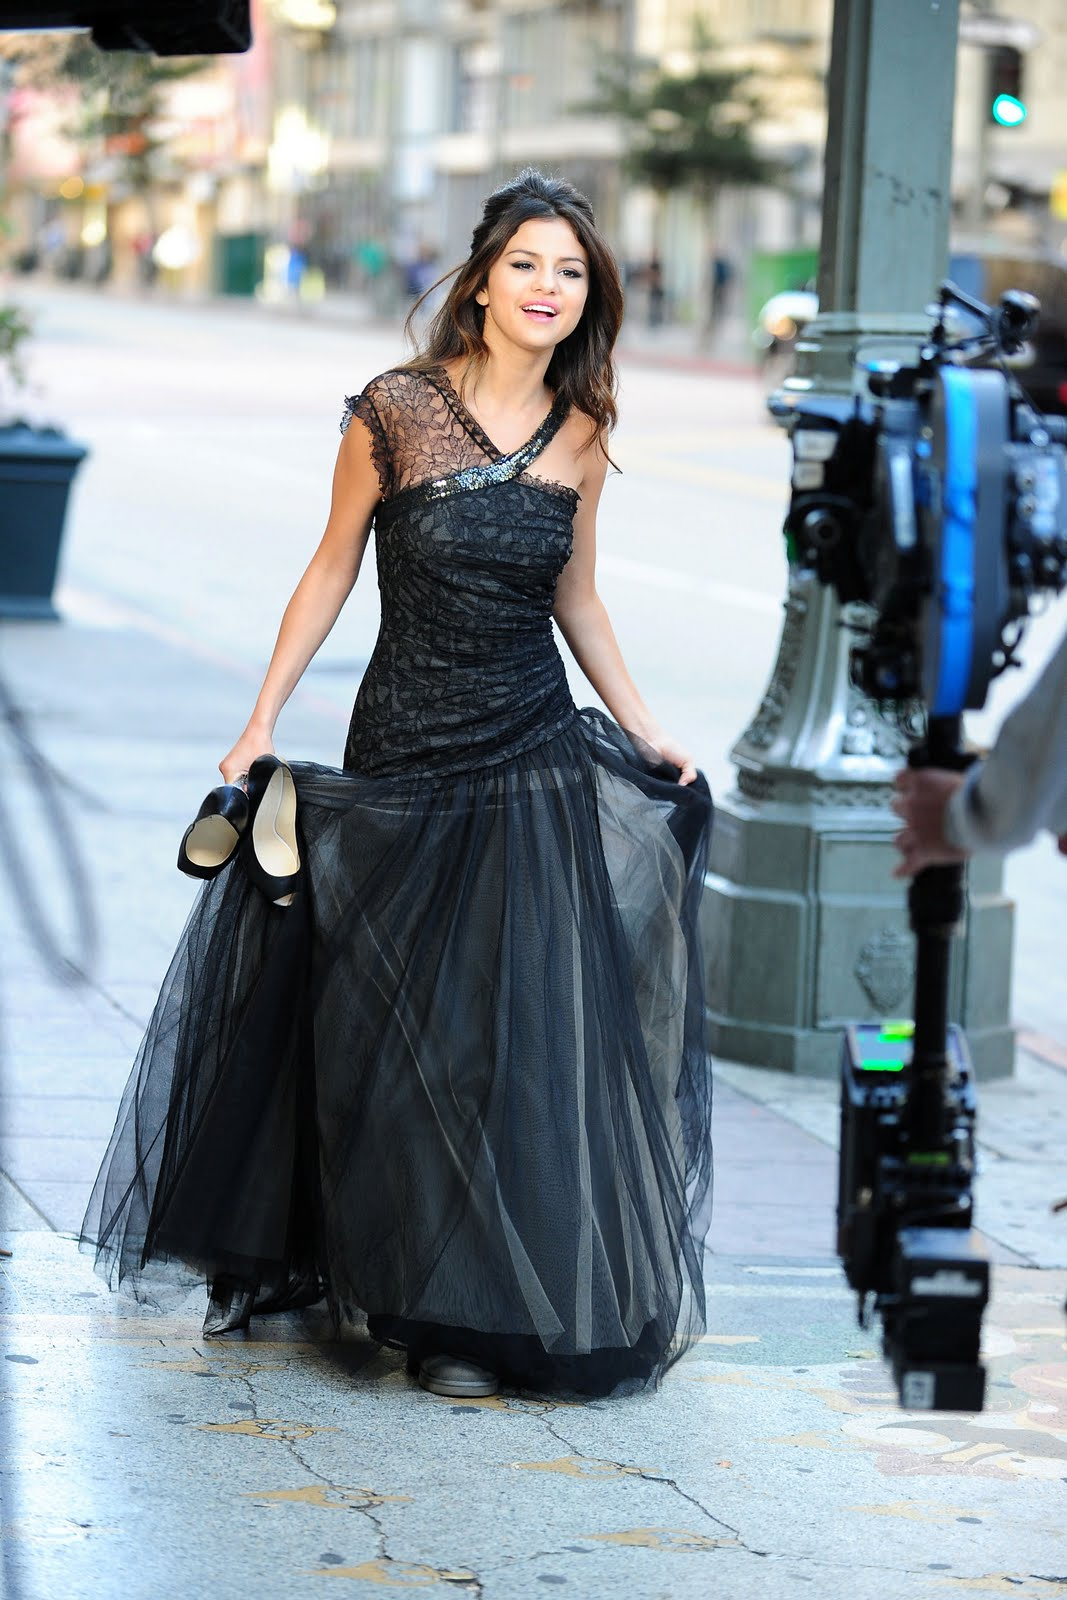 http://4.bp.blogspot.com/-kjw0CklhckI/Tbtqw72HCqI/AAAAAAAAABM/nud0QfQTudk/s1600/Selena-Gomez-who-says-2.jpg